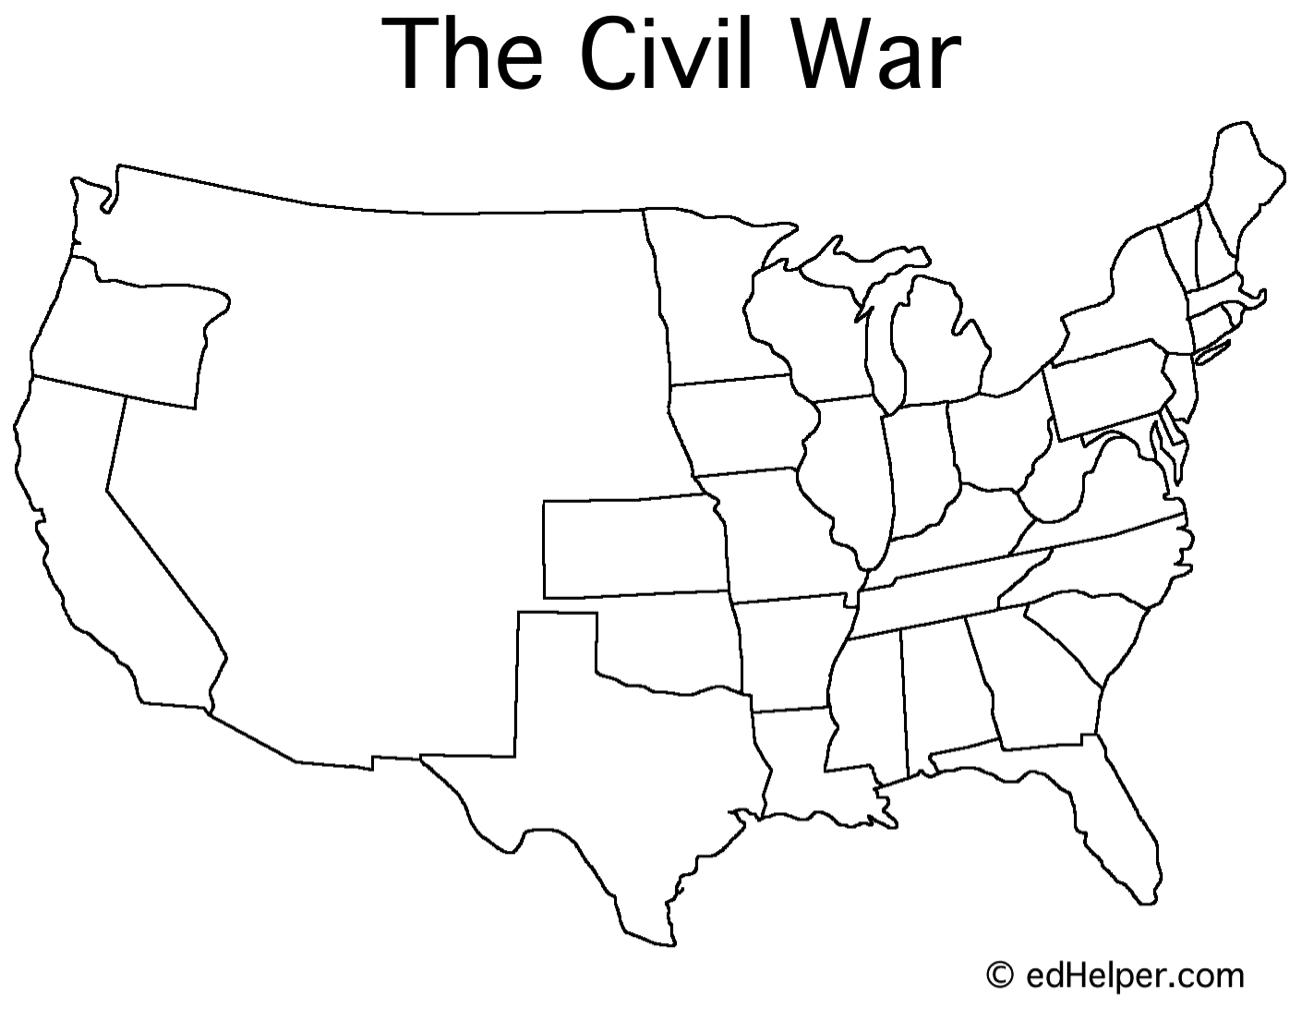 Blank Us Civil War Map Printable Editable Blank Calendar - Us history civil war blank map